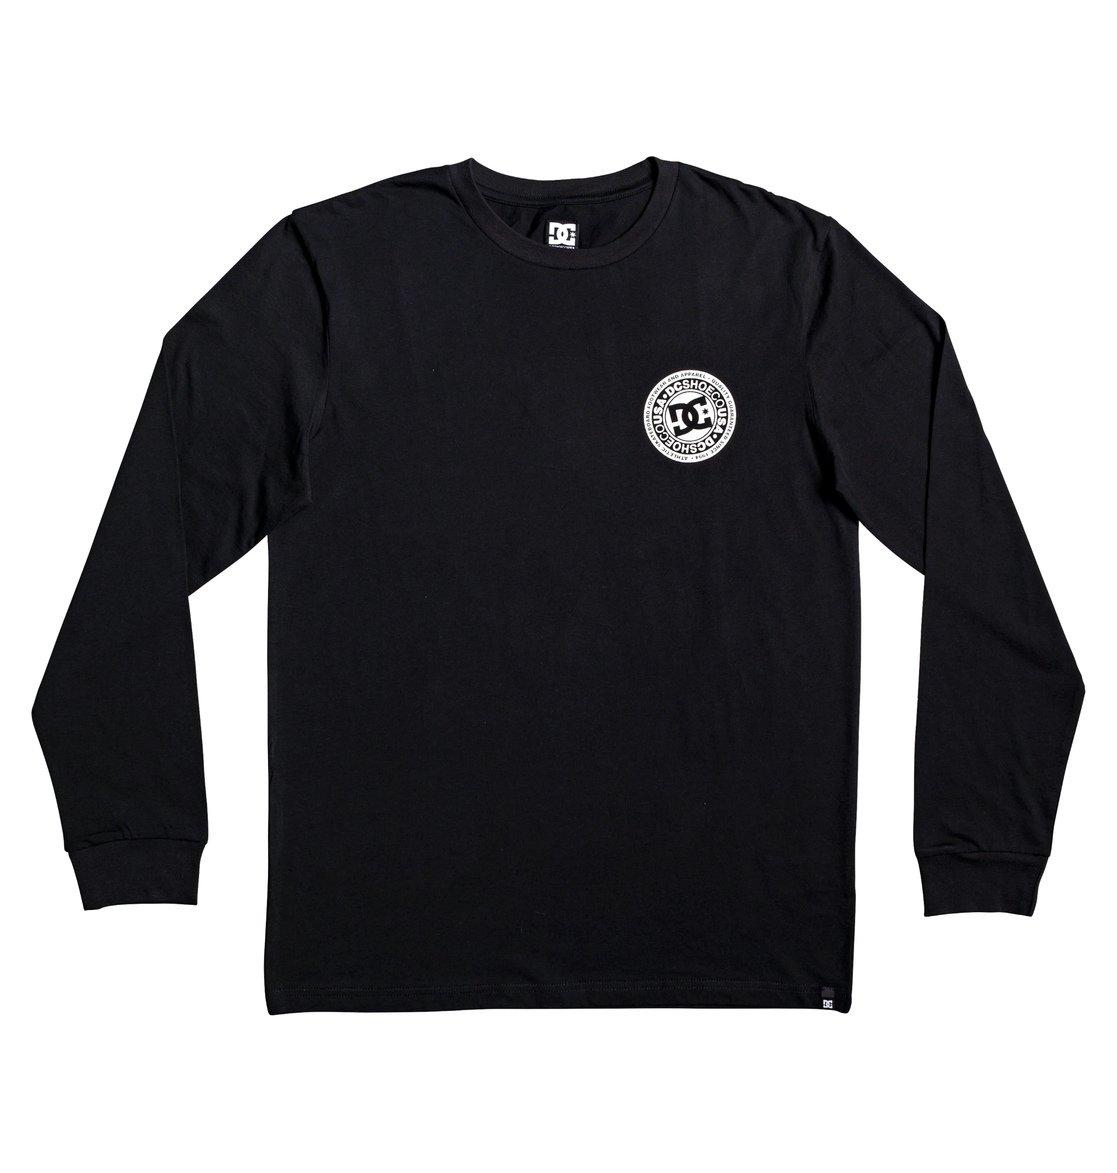 afb806739f Circle Star - Long Sleeve T-Shirt for Boys 8-16 EDBZT03283 | DC Shoes